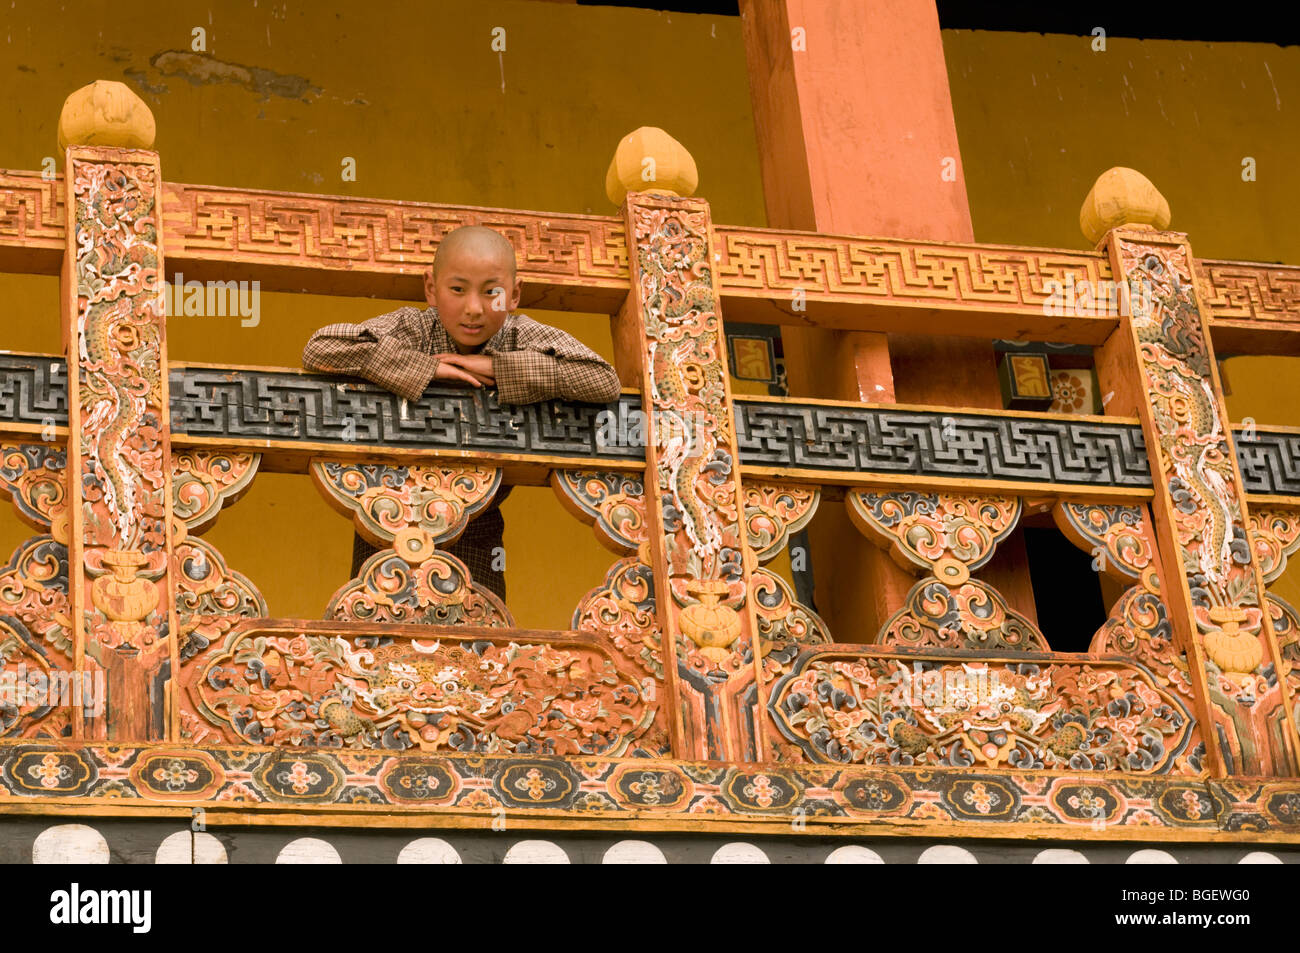 Boy in Punakha Dzong Monastery, BHUTAN - Stock Image